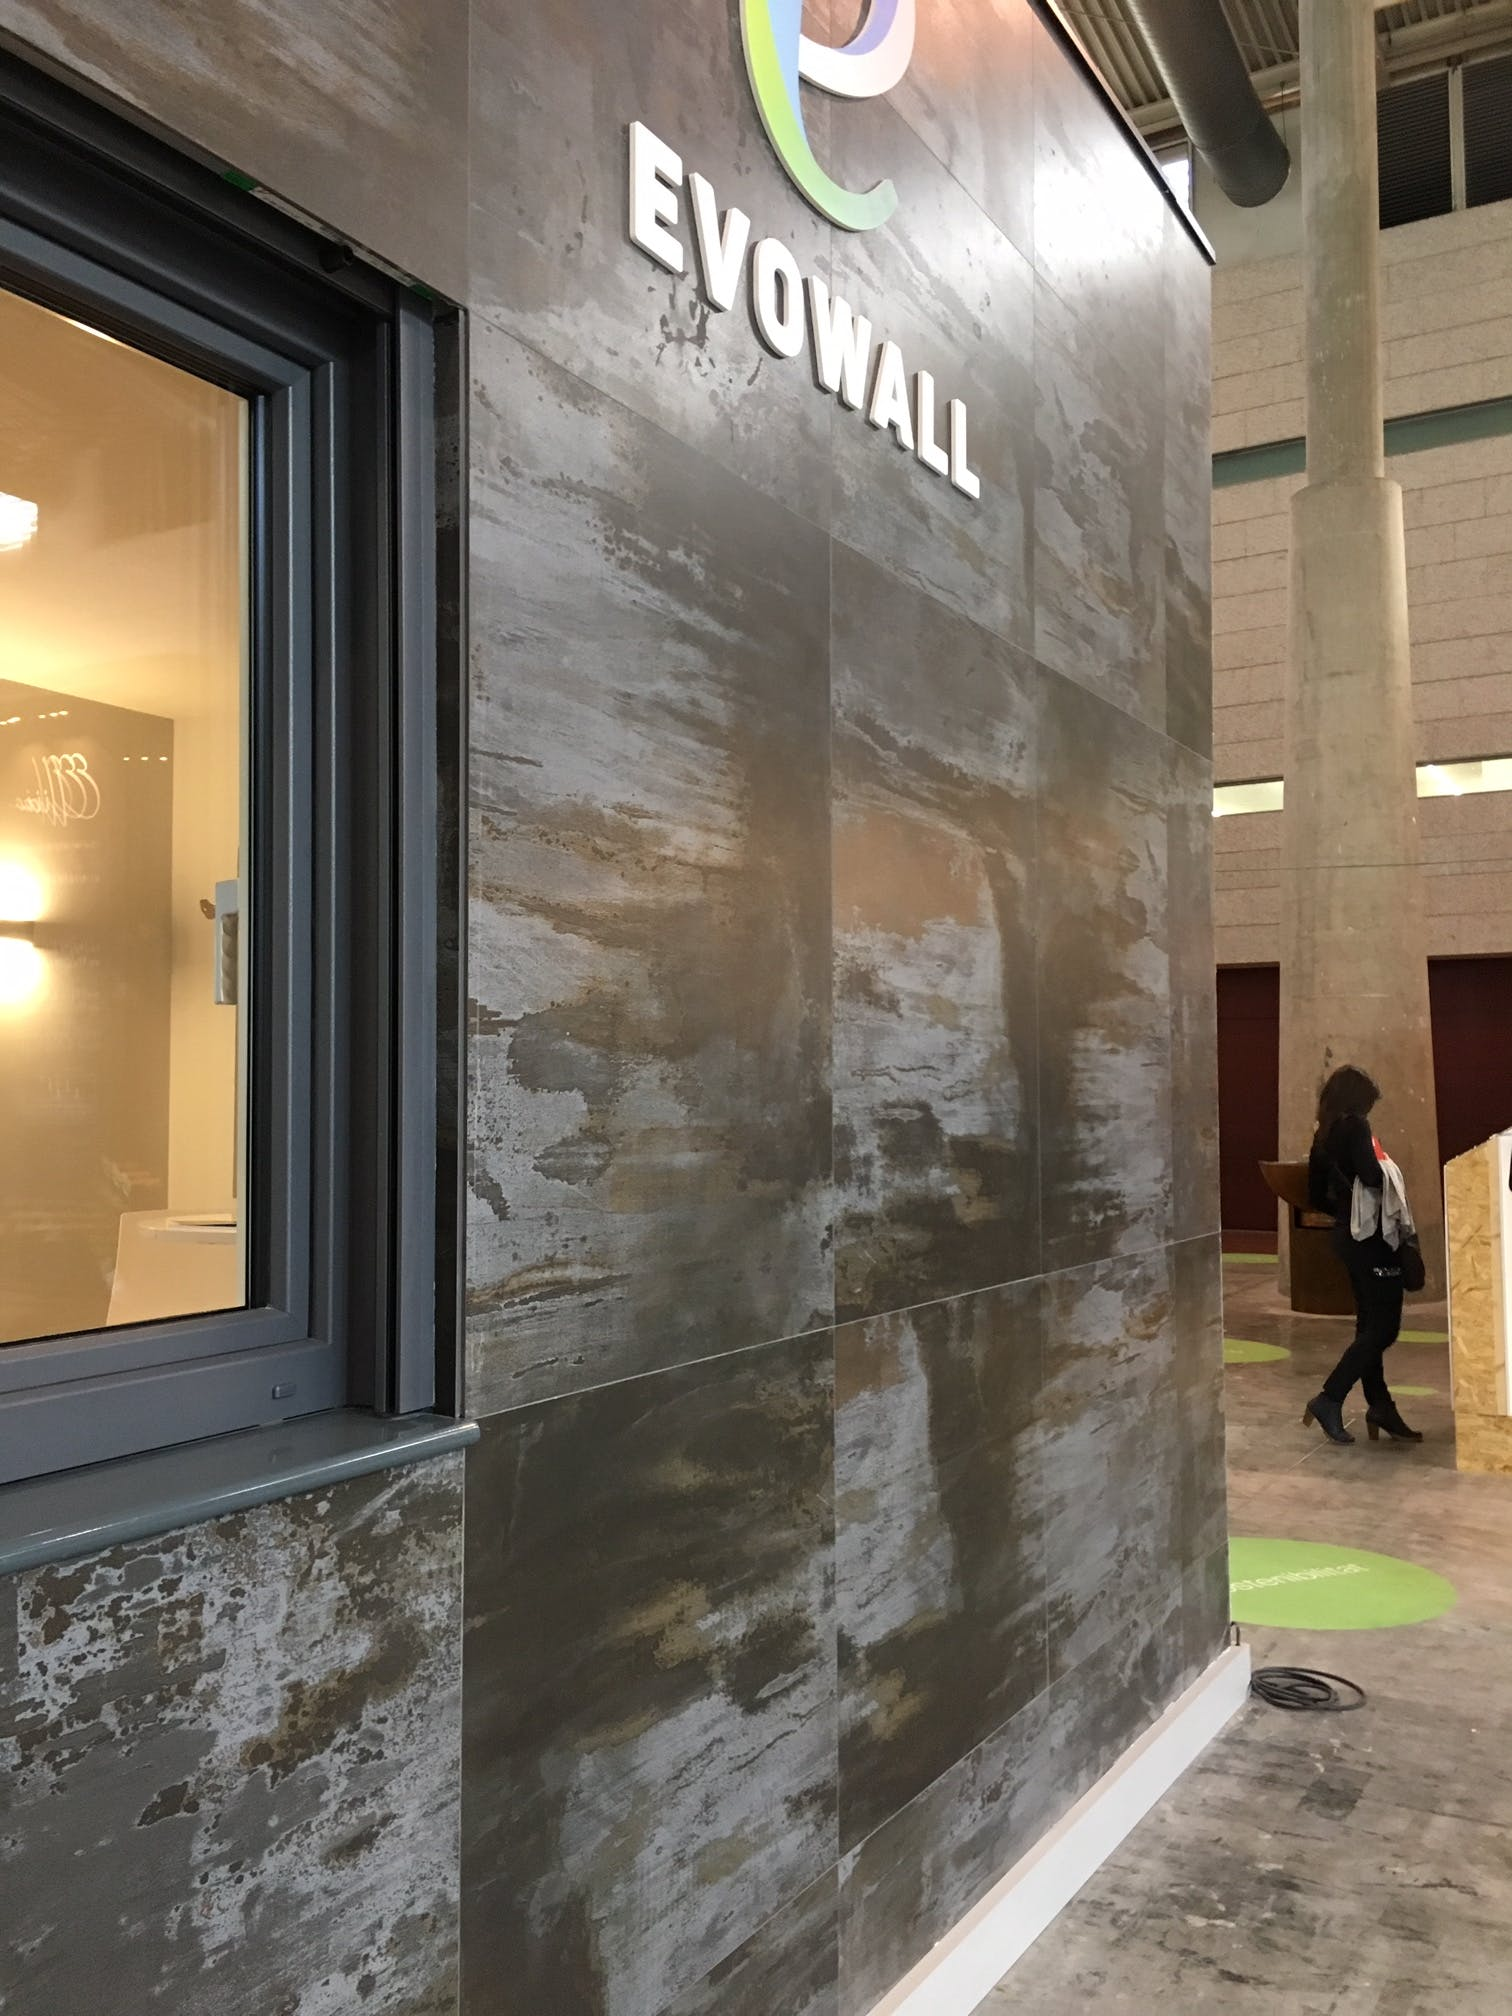 Image of Evowall en BBC 2019 Dekton by Cosentino 2 Trilium 1 in Dekton at Barcelona Building Construmat 2019 - Cosentino